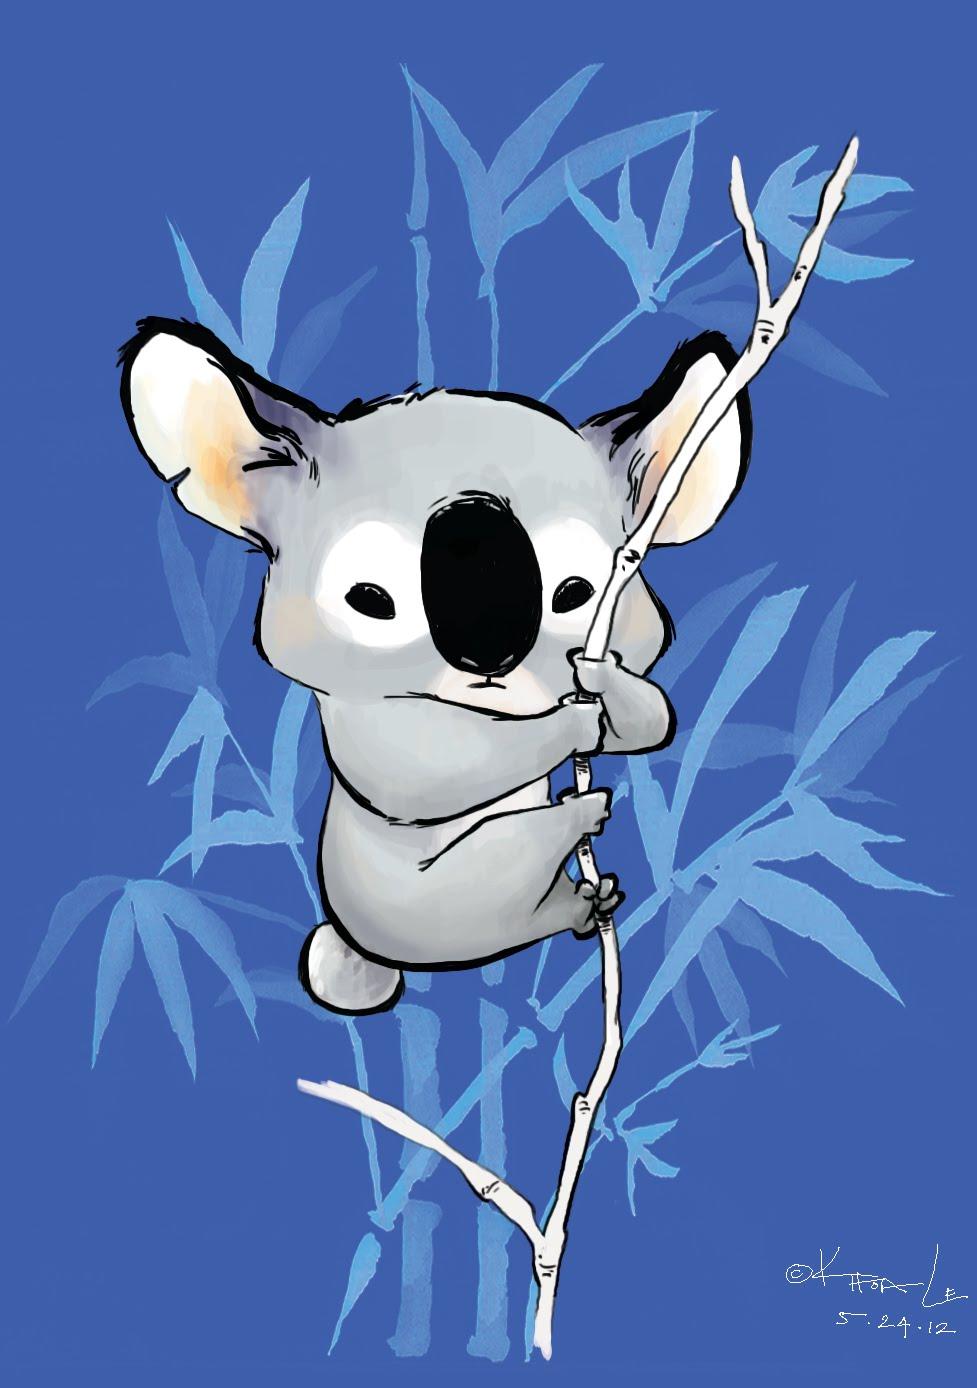 Most Inspiring Wallpaper Koala Cartoon - koala_line  Pic_94322   .jpg